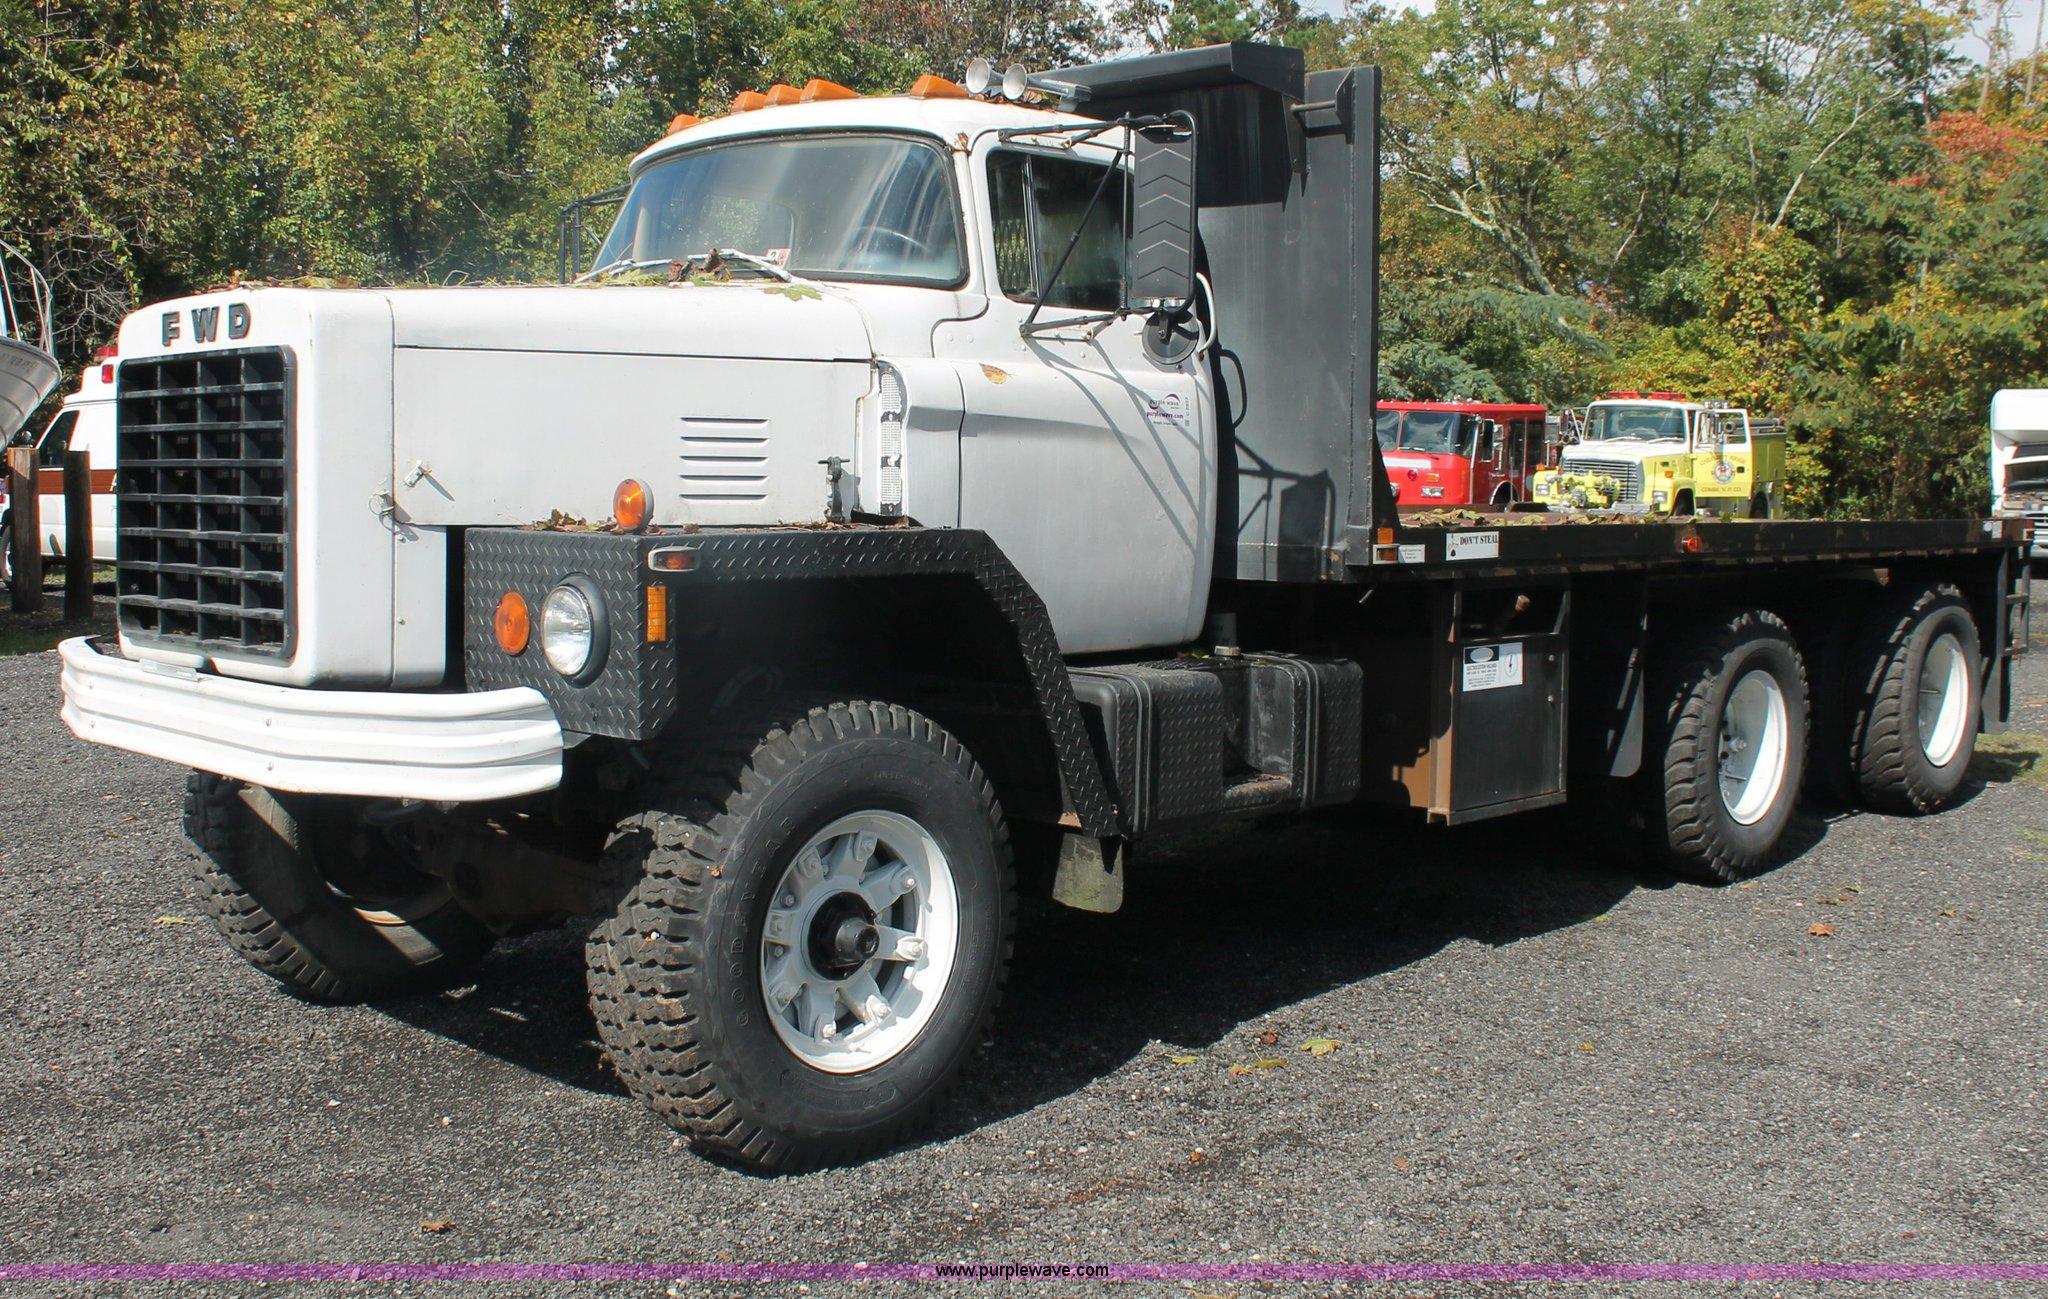 1969 FWD LB6 3317 flatbed truck Item C2923